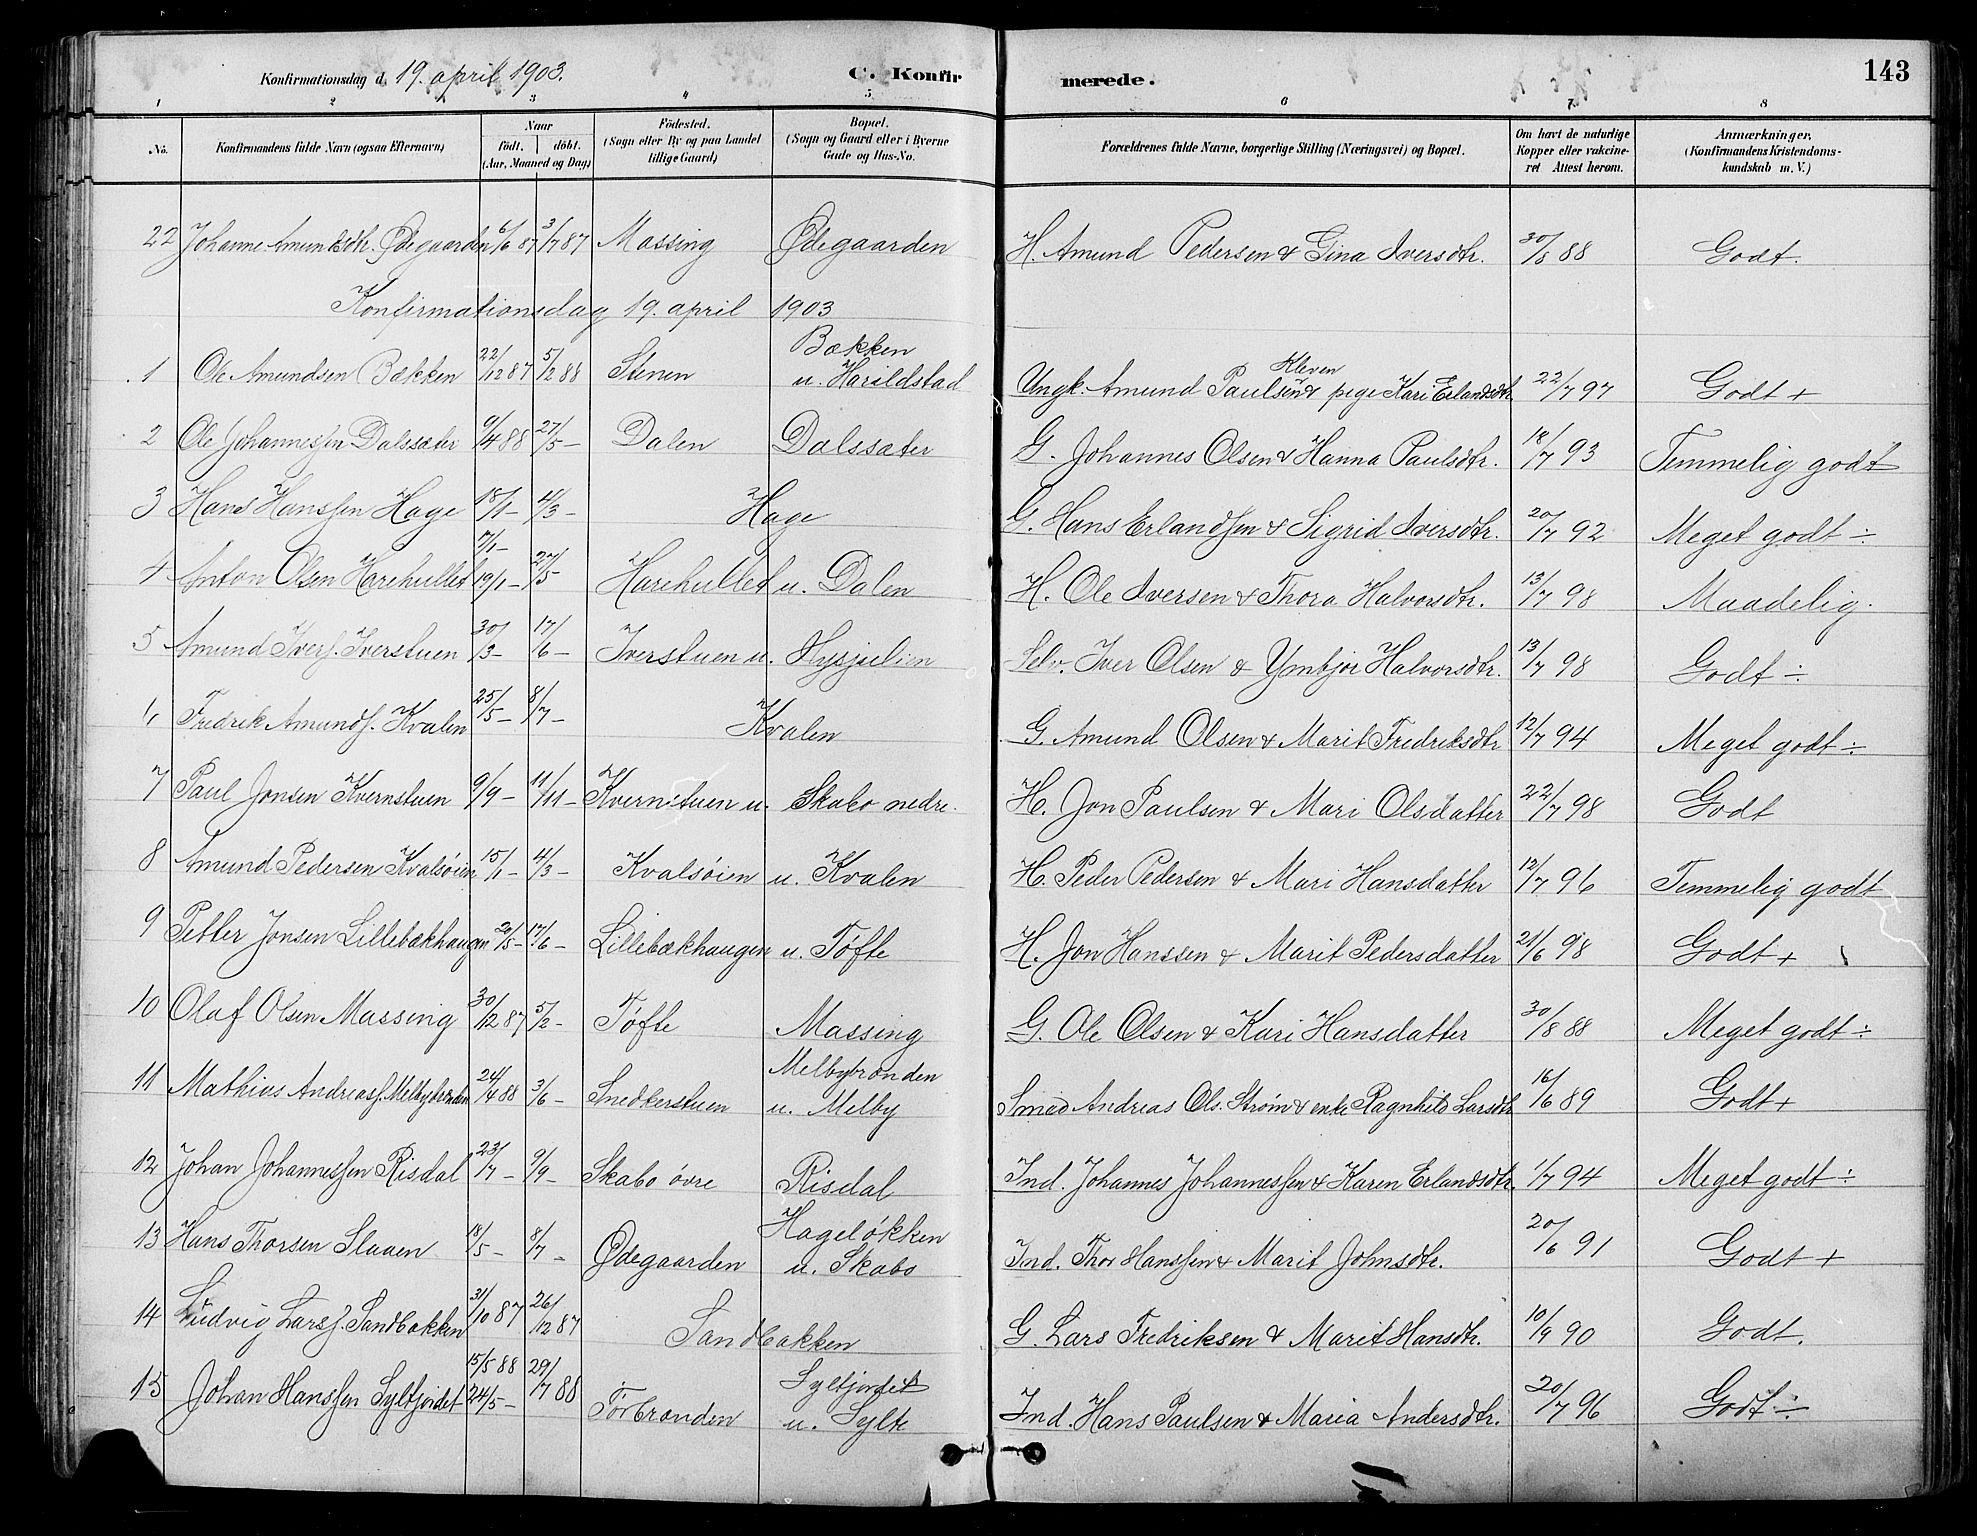 SAH, Nord-Fron prestekontor, Klokkerbok nr. 5, 1884-1914, s. 143